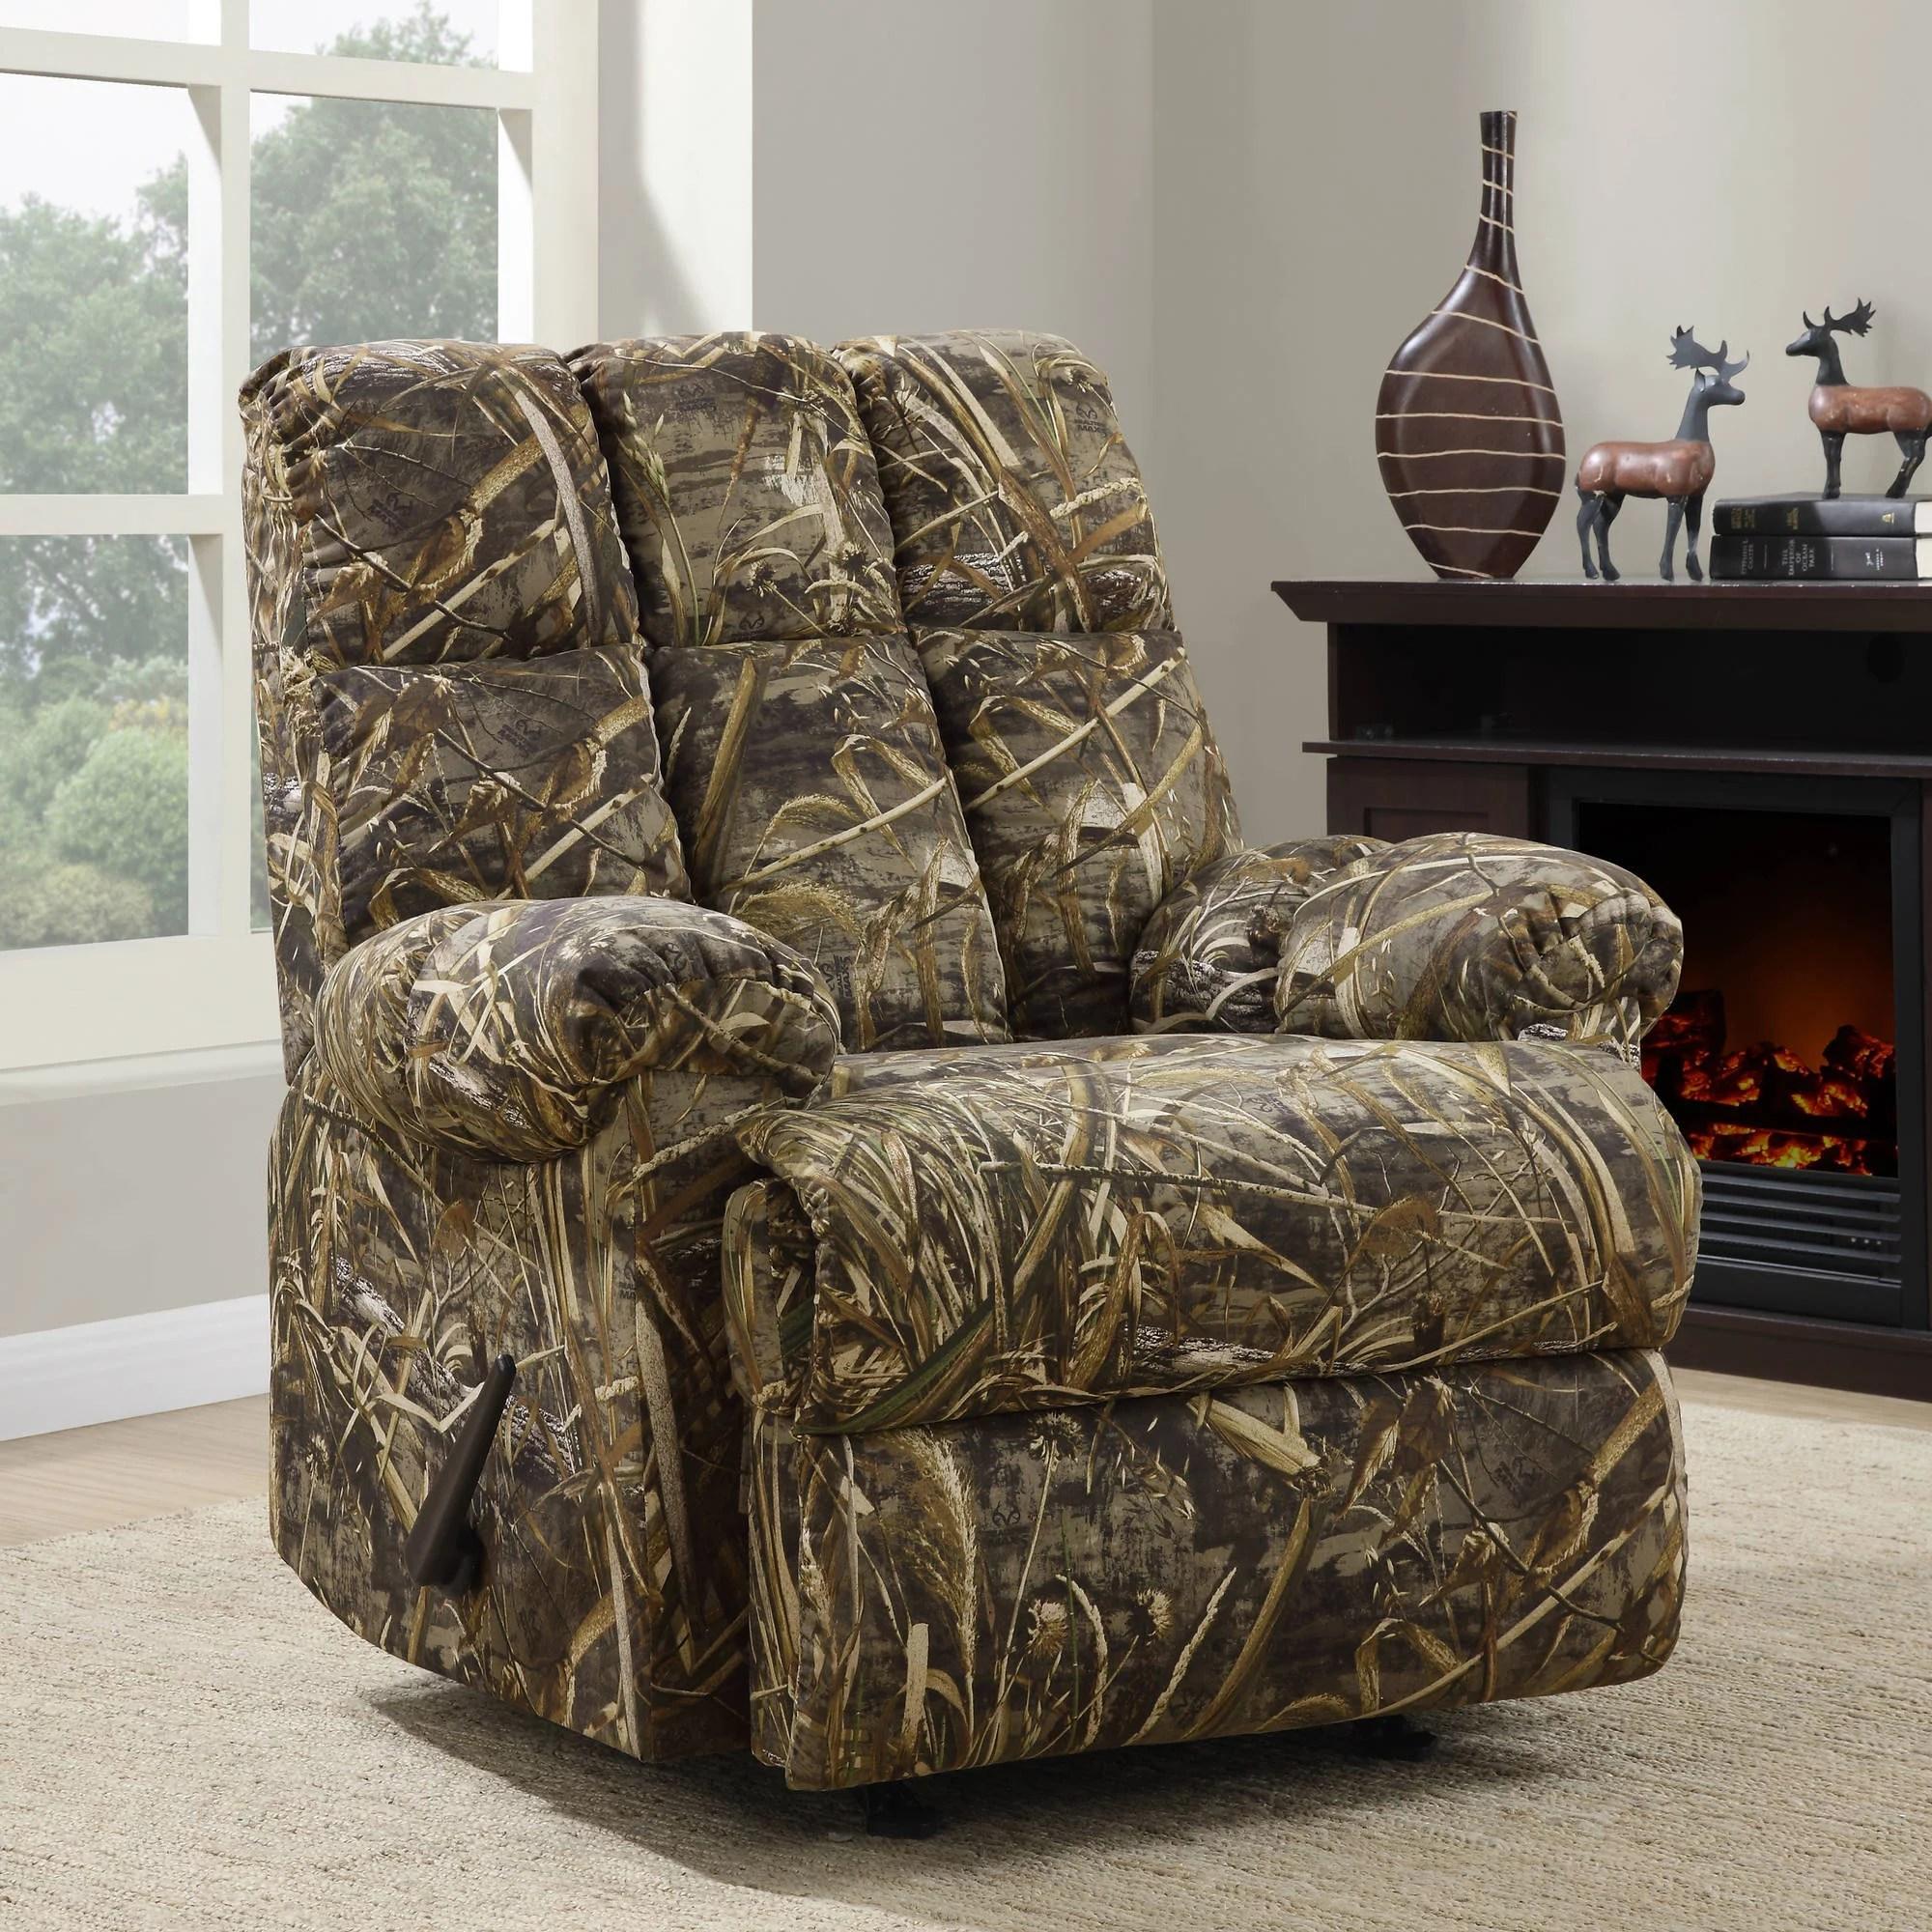 camo recliner chair covers london dorel living realtree camouflage rocker walmart com